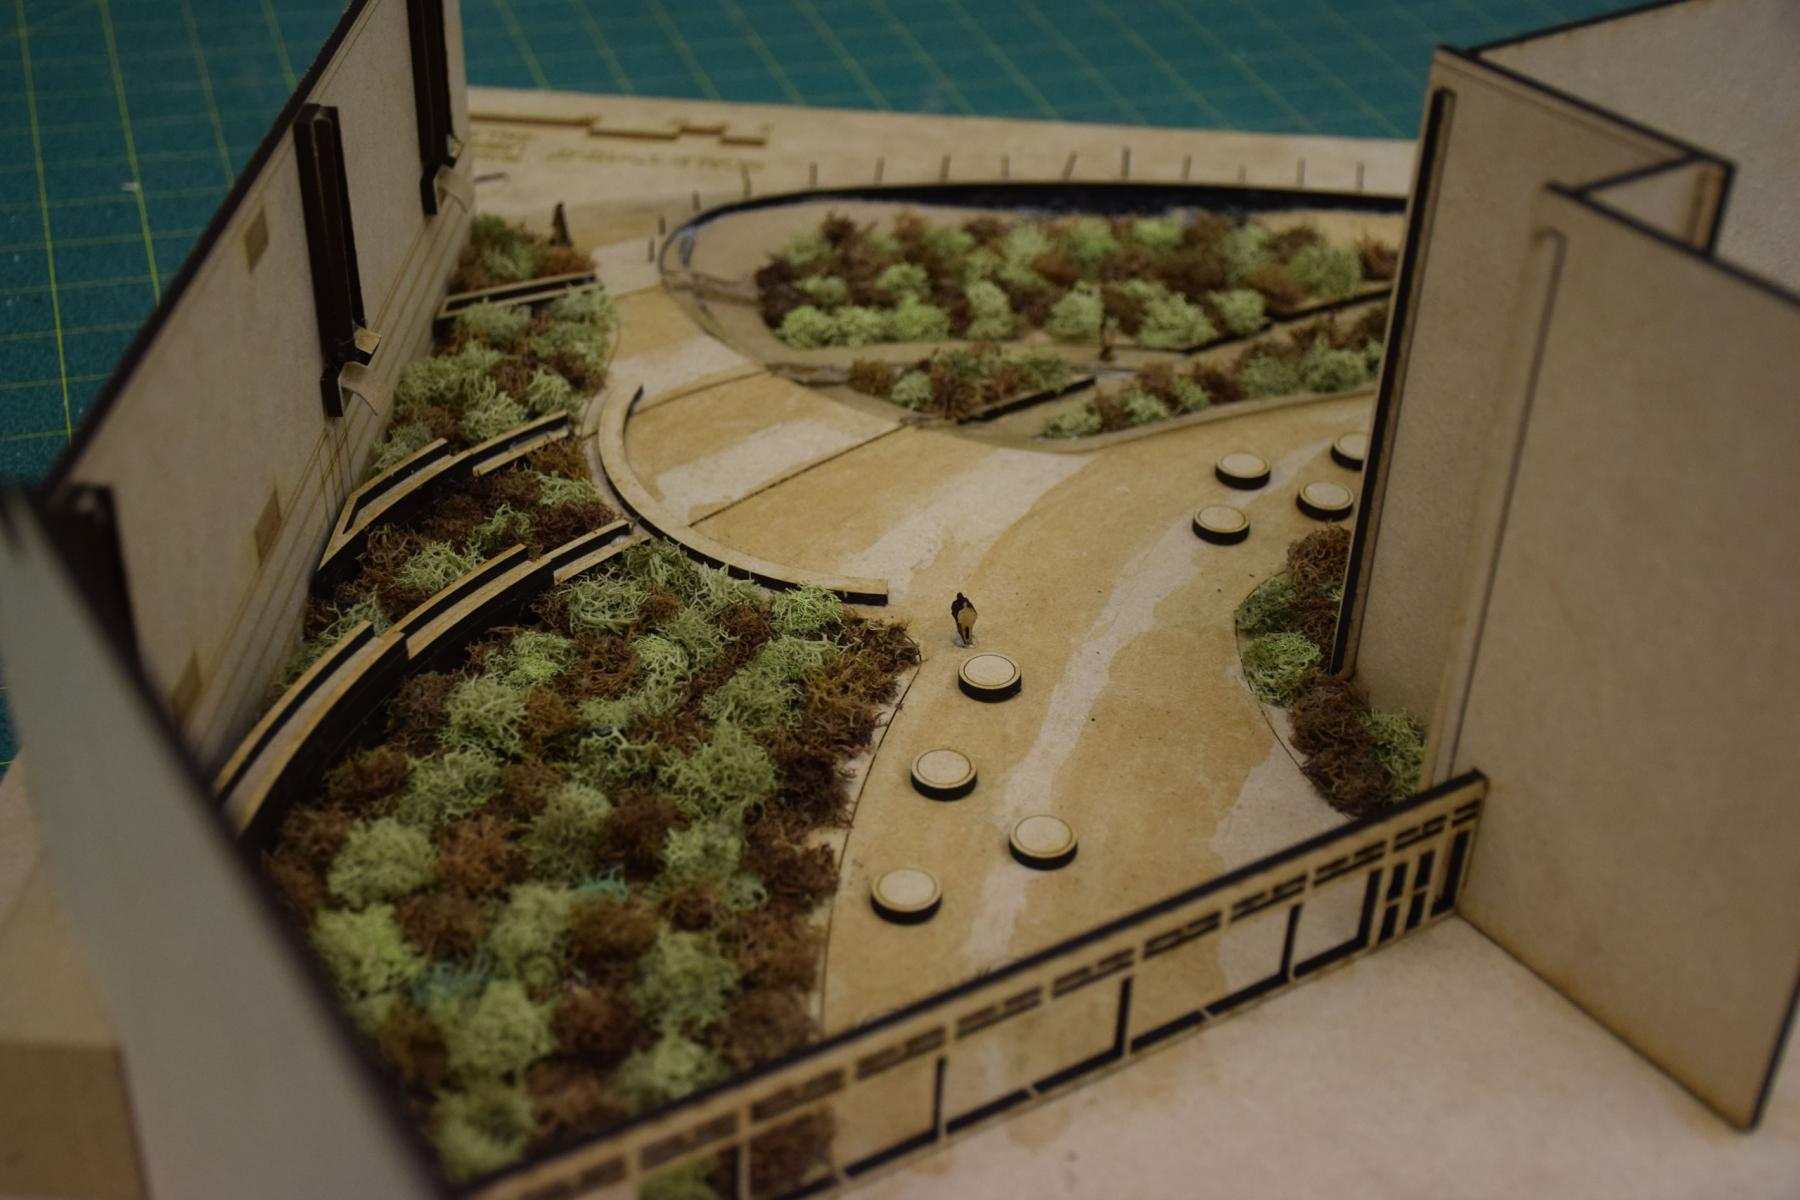 023 Ni Artful Rainwater Design Larch 211 F14 Webitokdyjp8sbg Landscape Architecture Essay Stunning Argumentative Topics Full